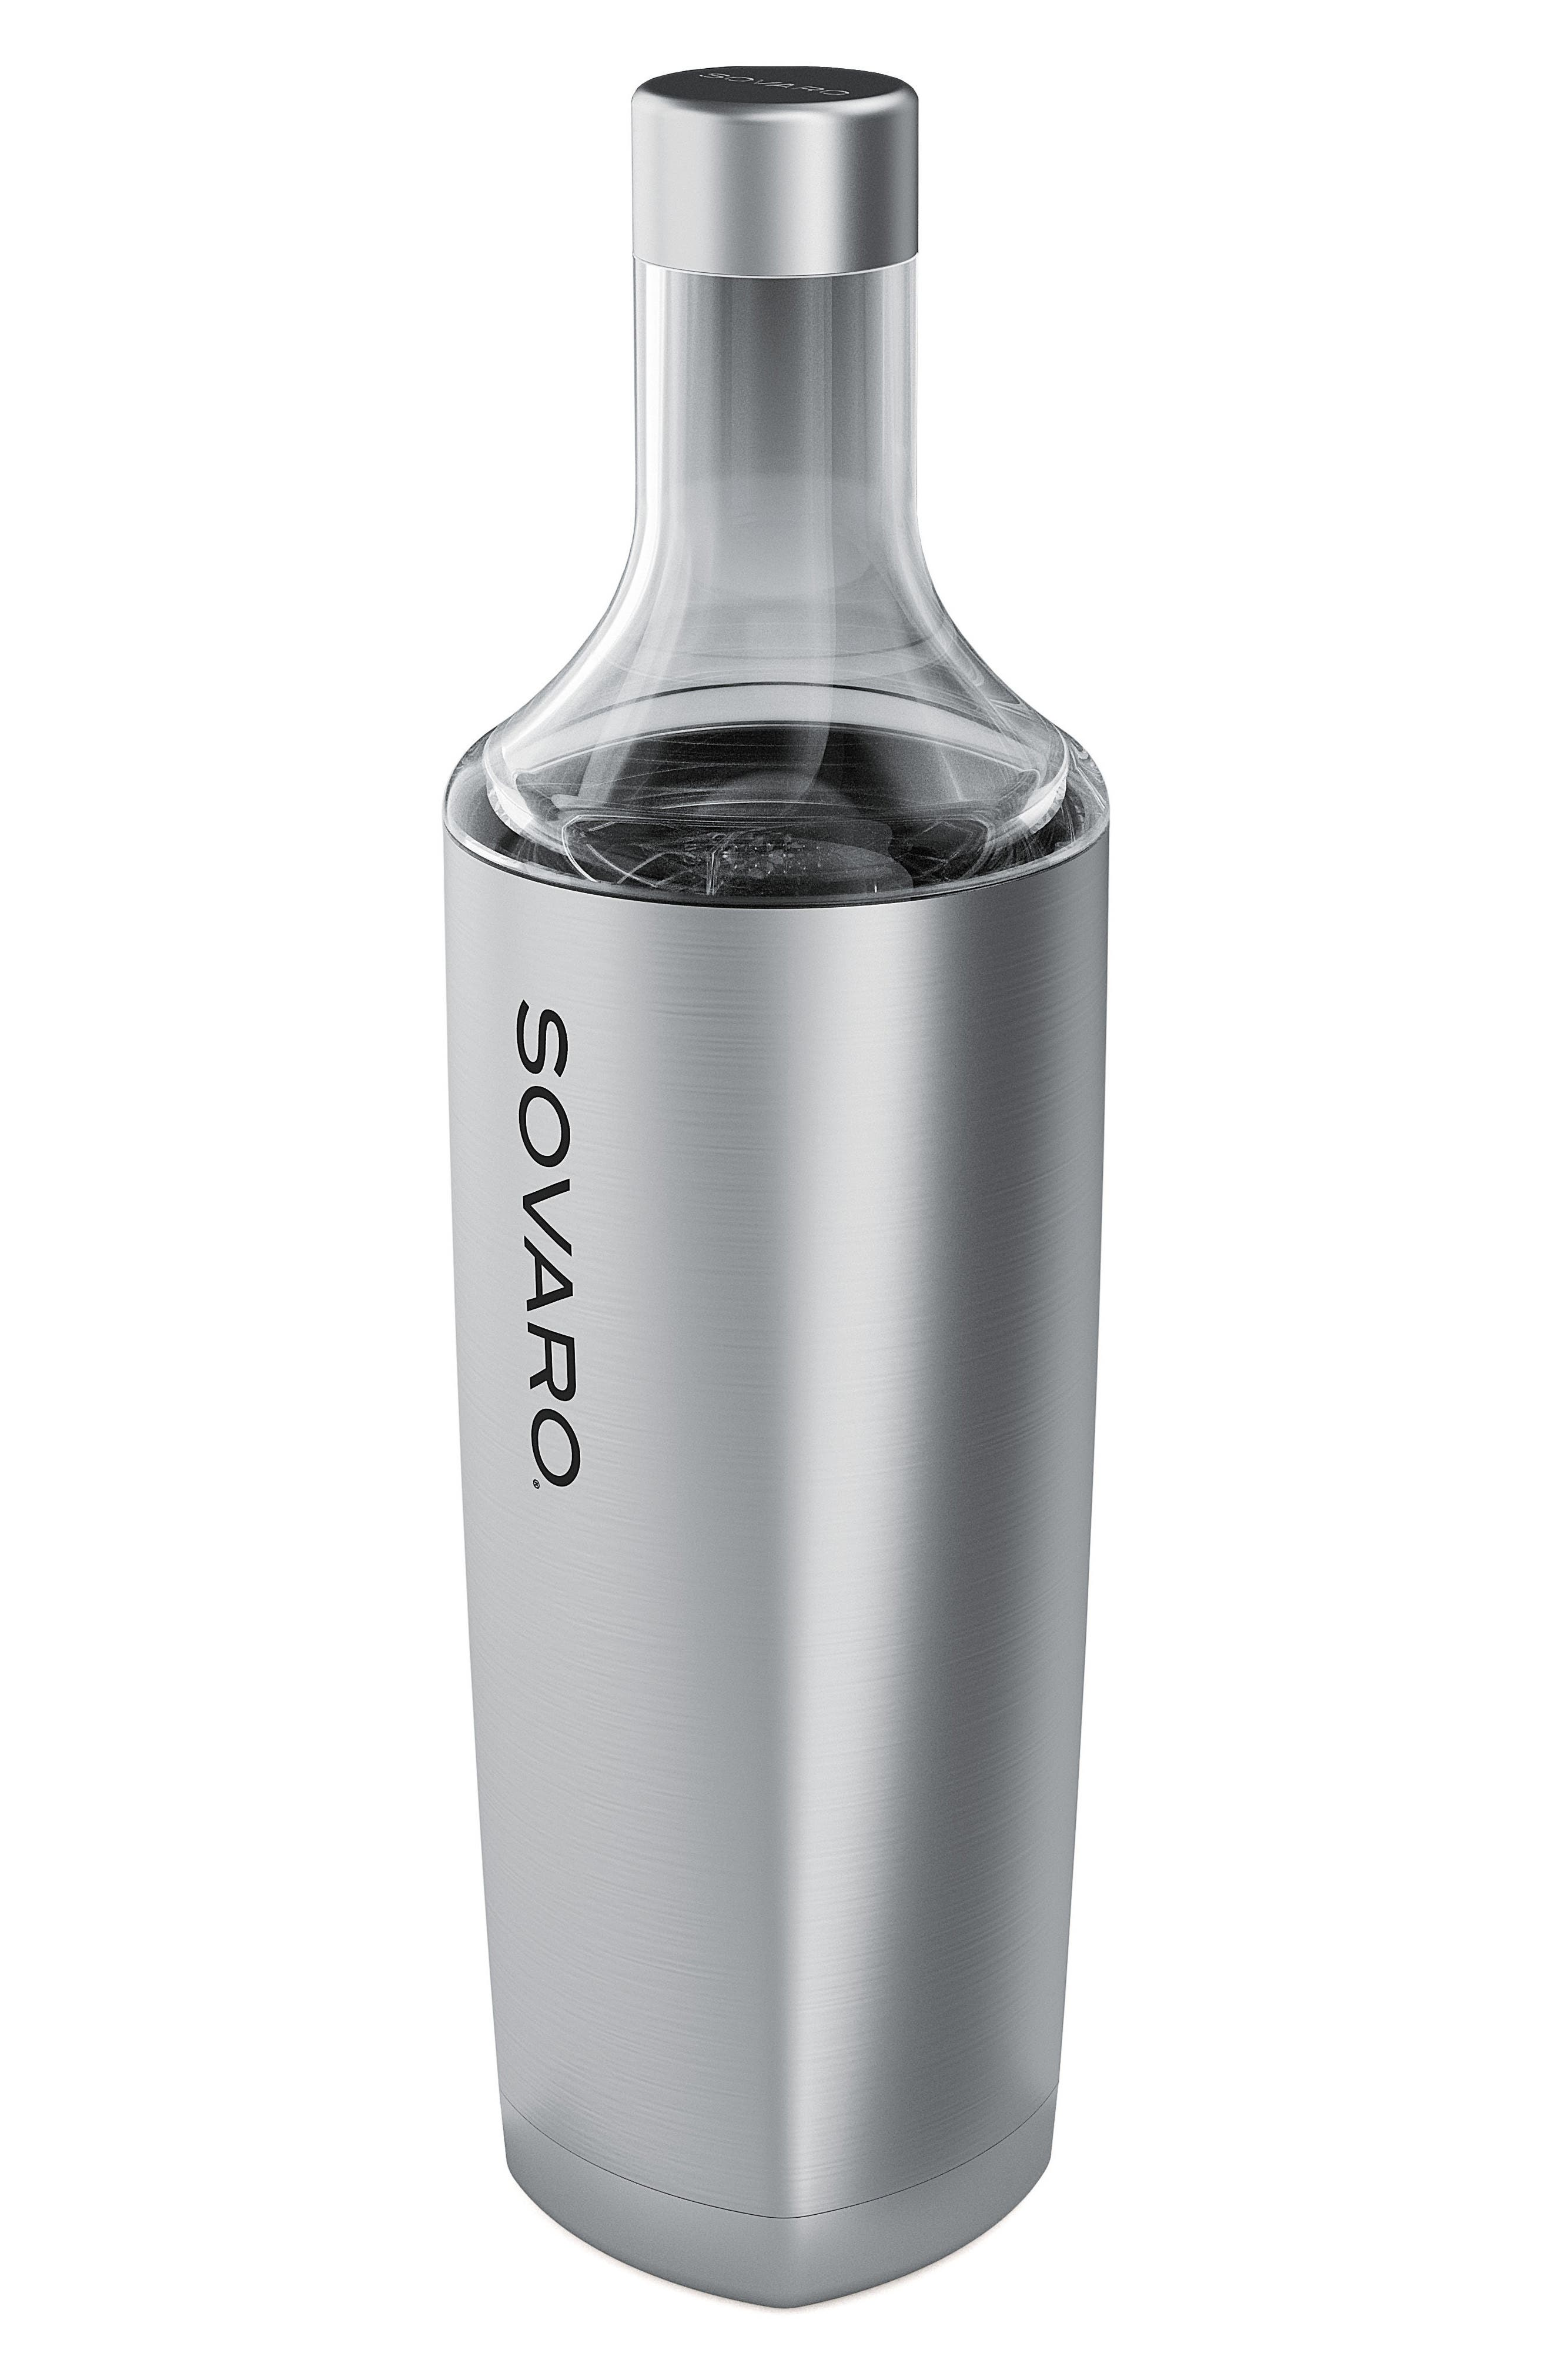 Main Image - Sovaro 25-Ounce Insulated Beverage Bottle